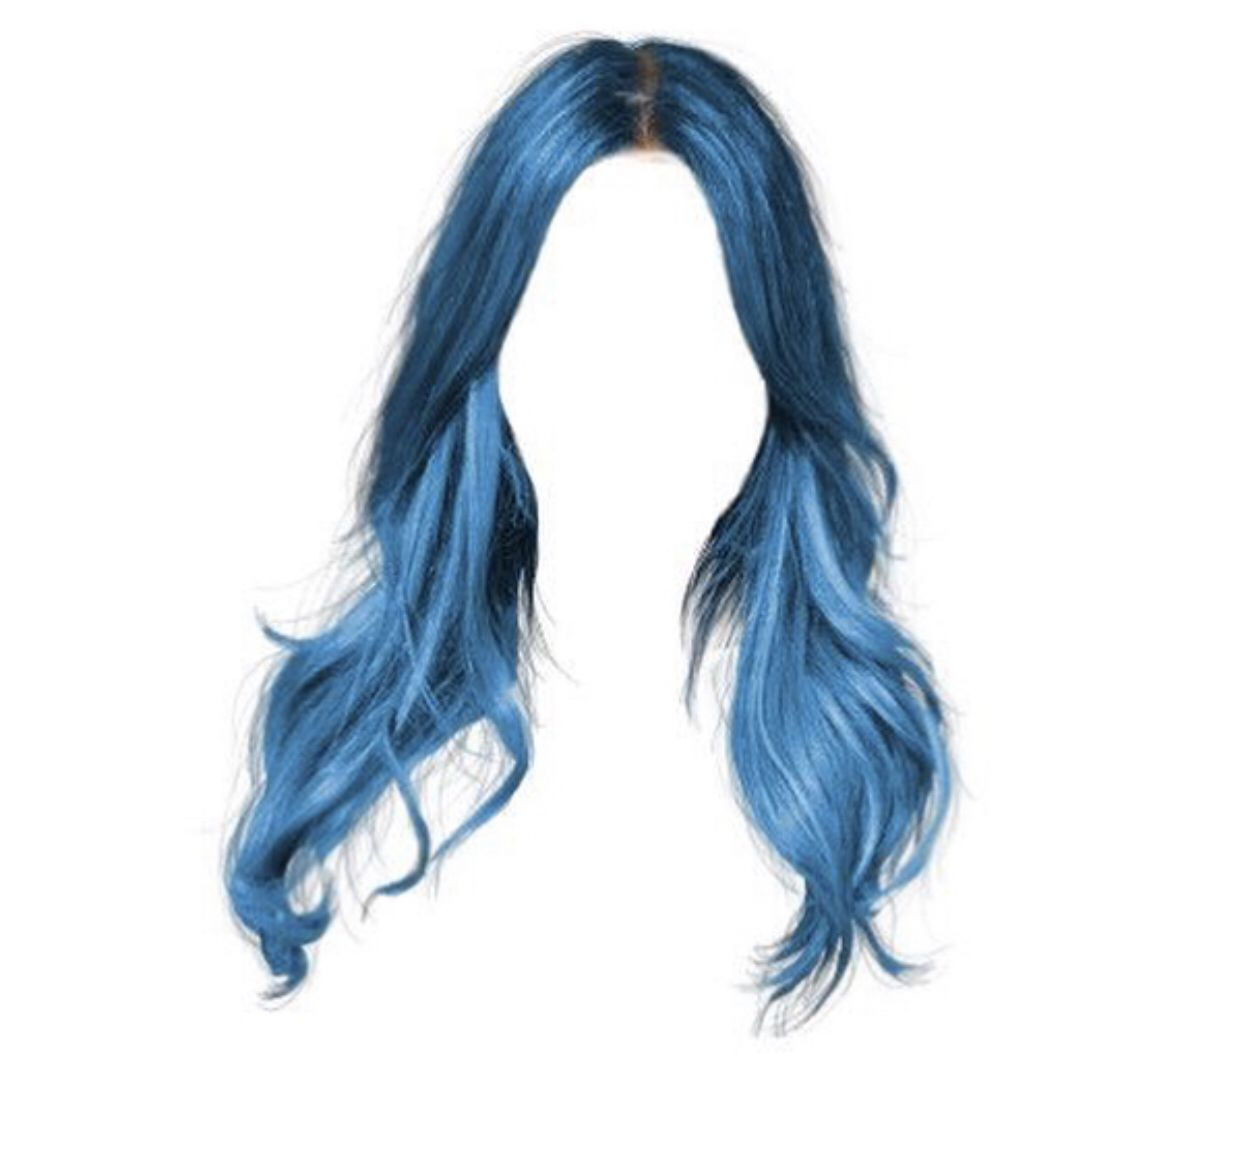 Dyed Hair Png Dyed Hair Png Png Of Blue Dyed Hair In 2020 Dyed Hair Hair Png How To Draw Hair